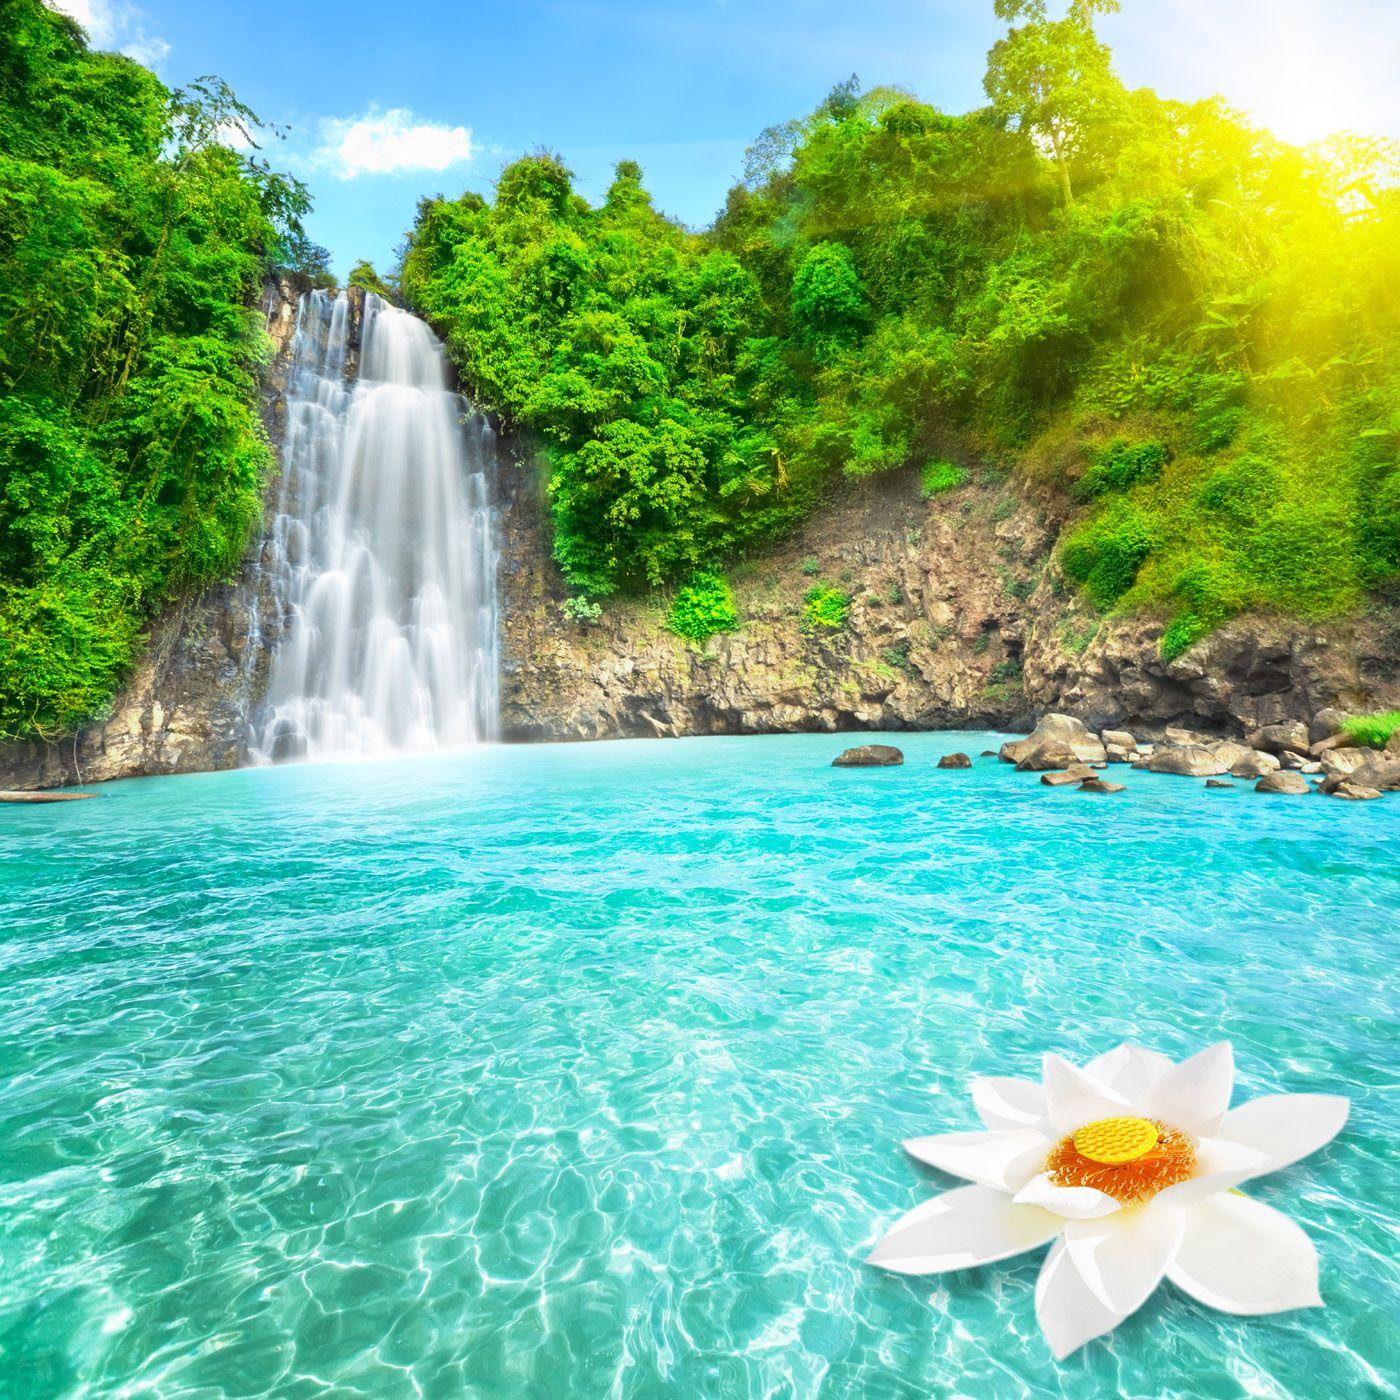 Amazing Nature: Waterfalls, Streams